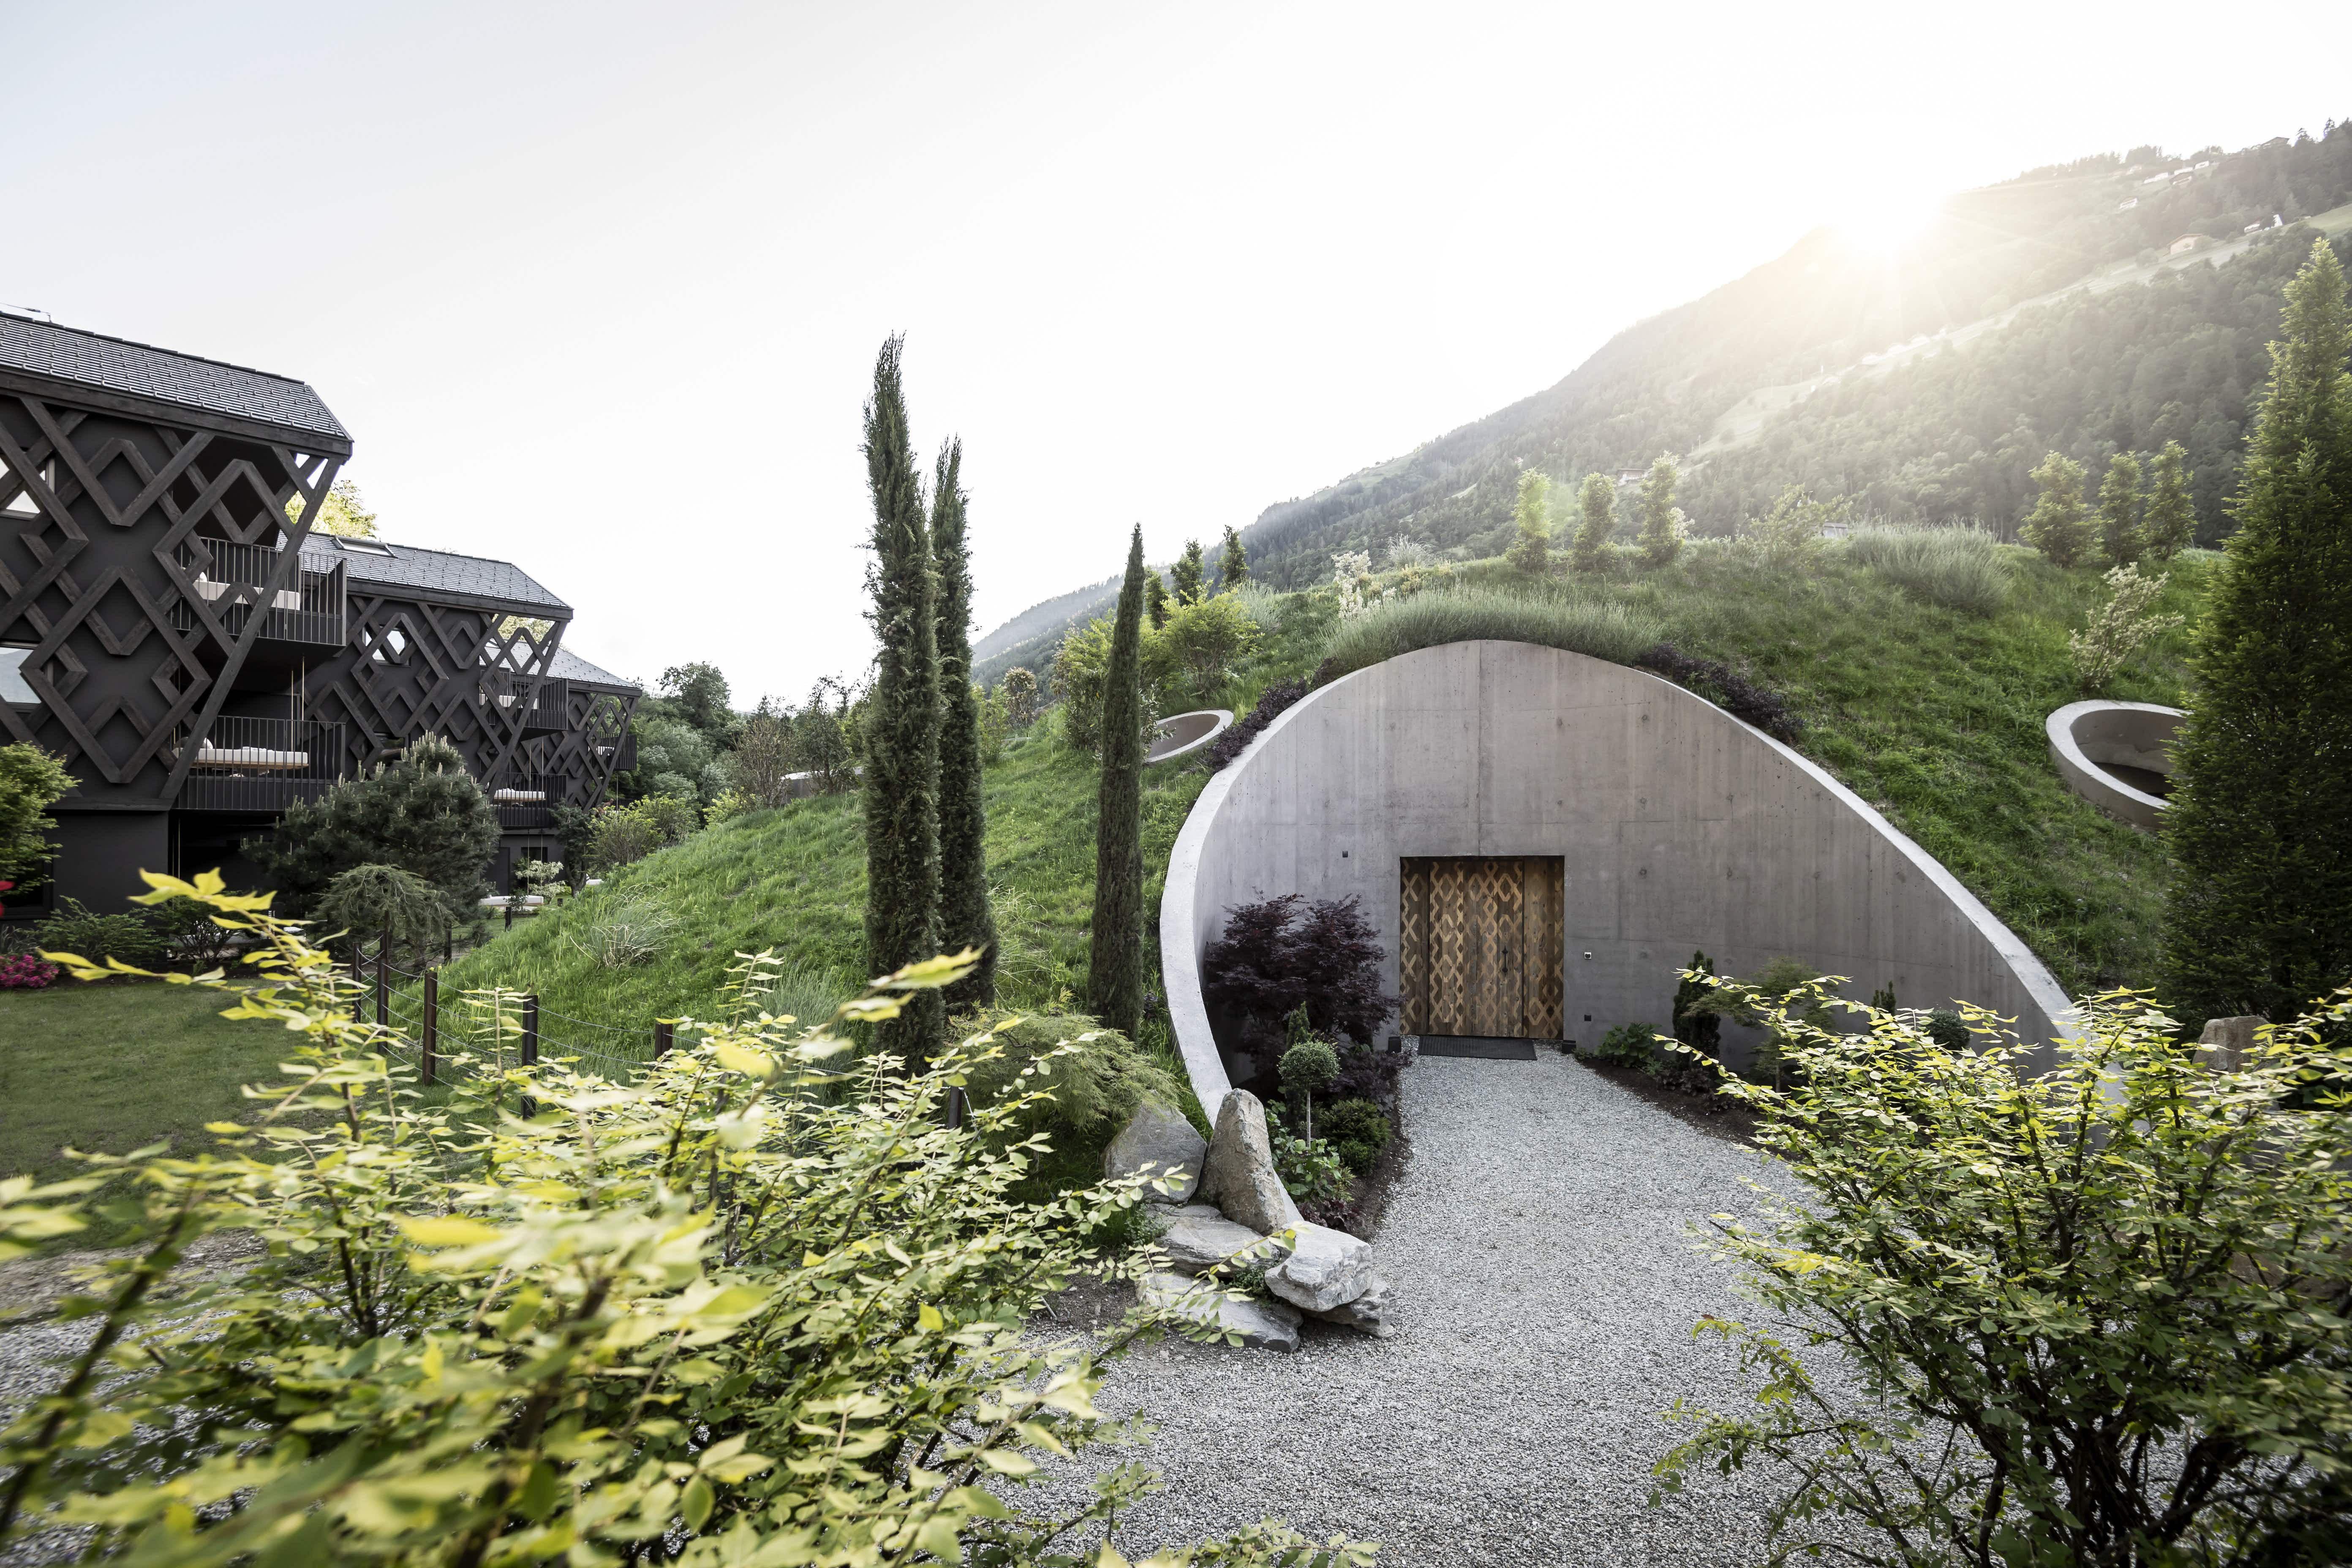 This Italian hotel has a new Tolkien-esque Hobbit hole